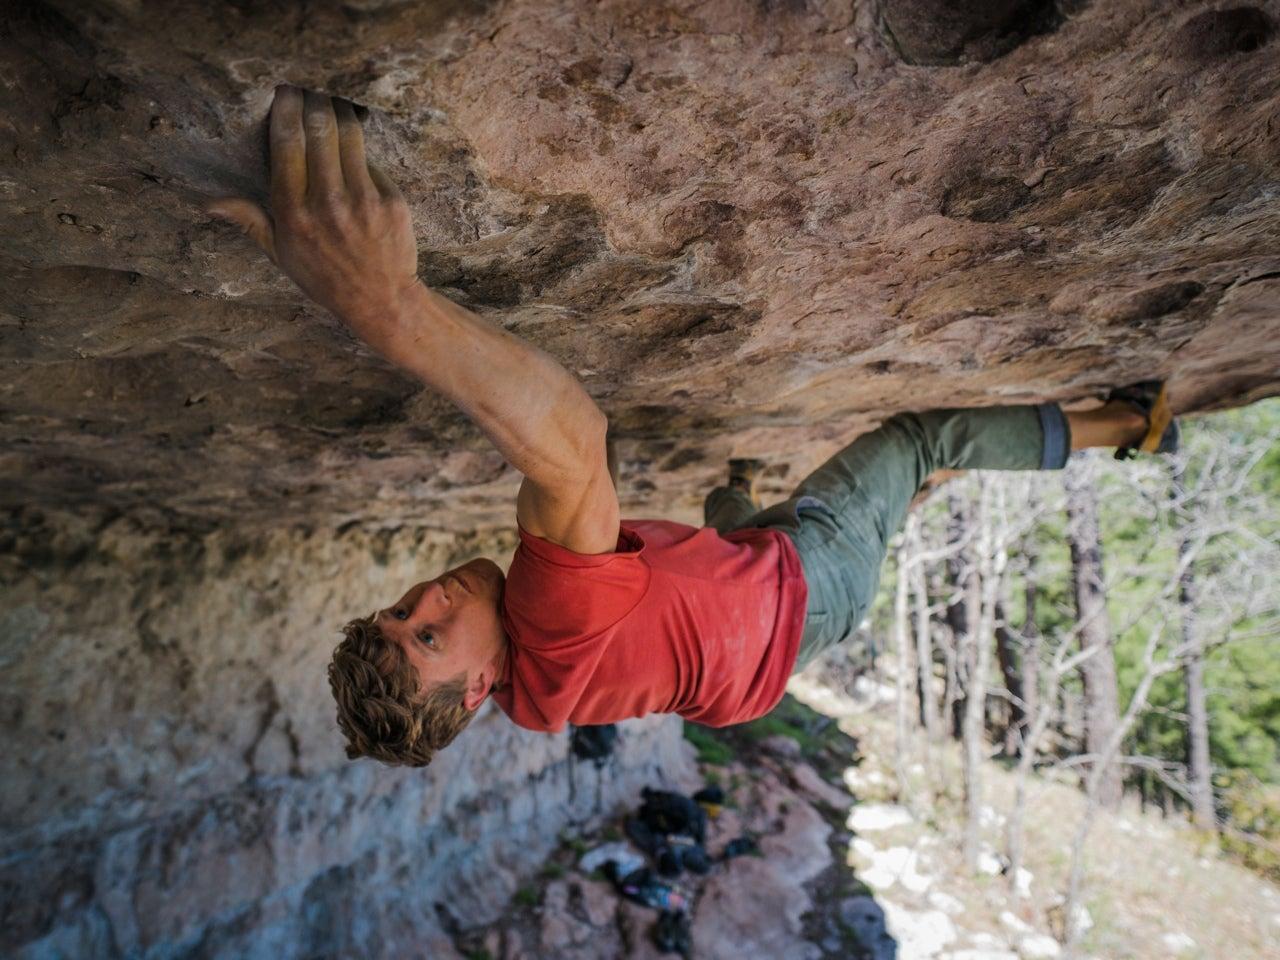 Up Close: Nik Berry On Climbing, Nursing And Attitude Adjustments